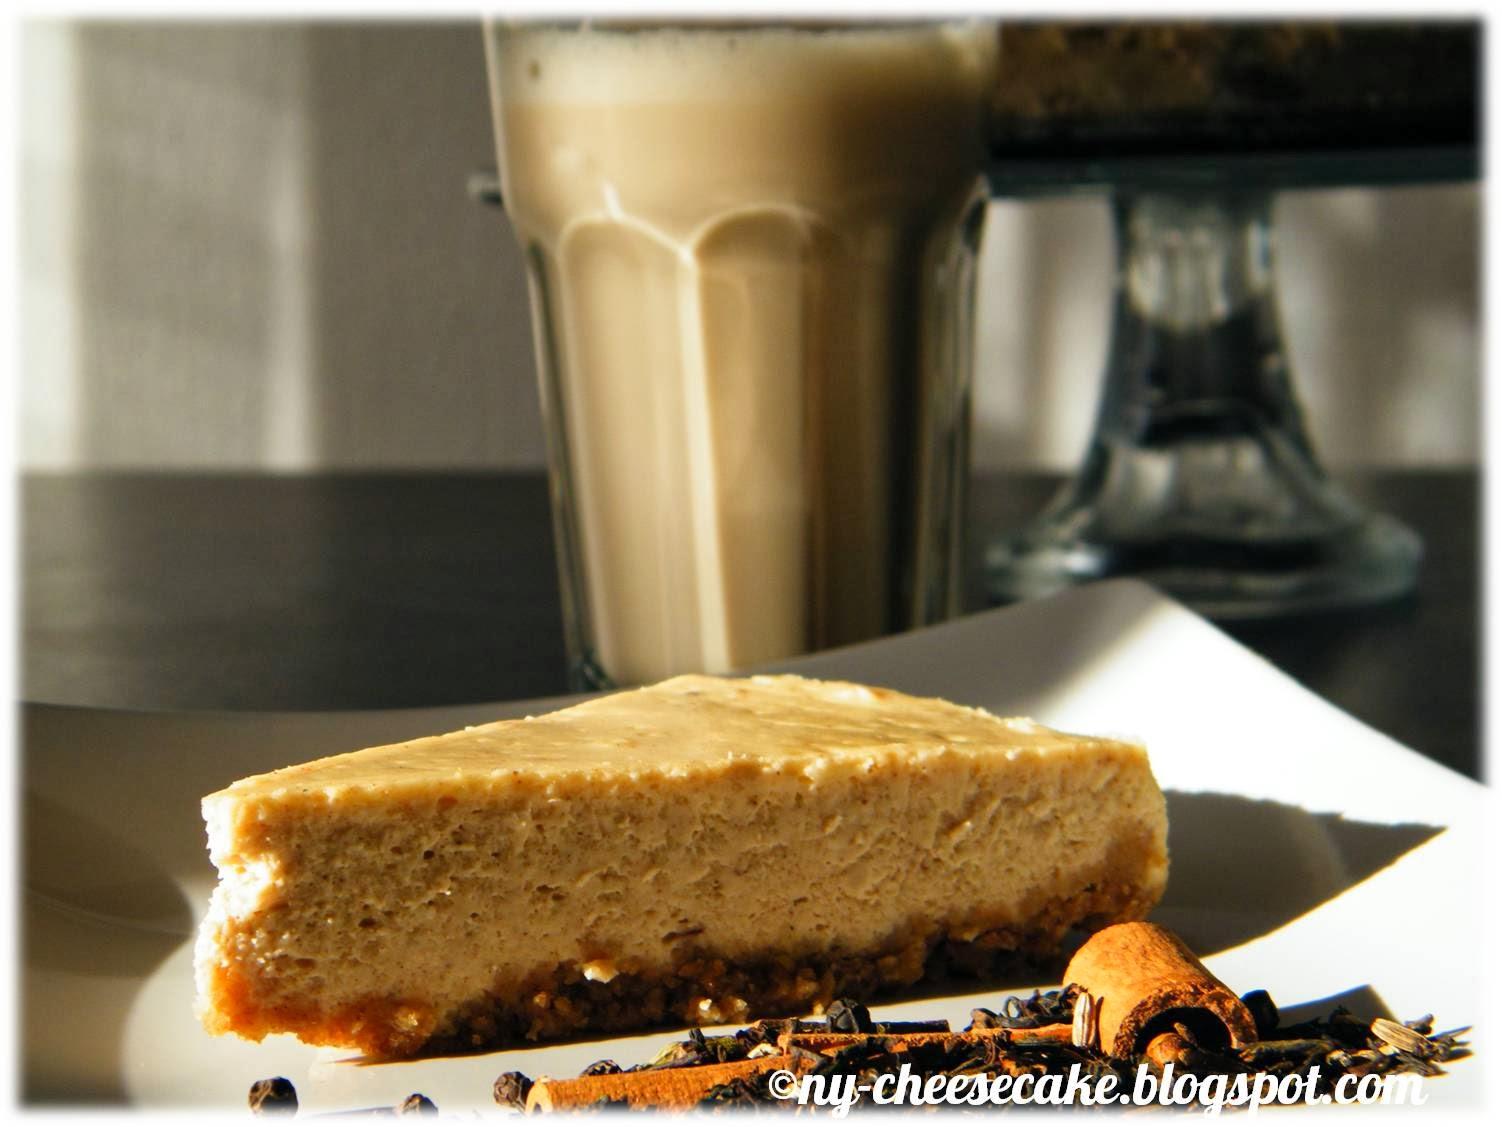 http://ny-cheesecake.blogspot.de/2012/10/chai-cheesecake-mit-weier-schokolade.html